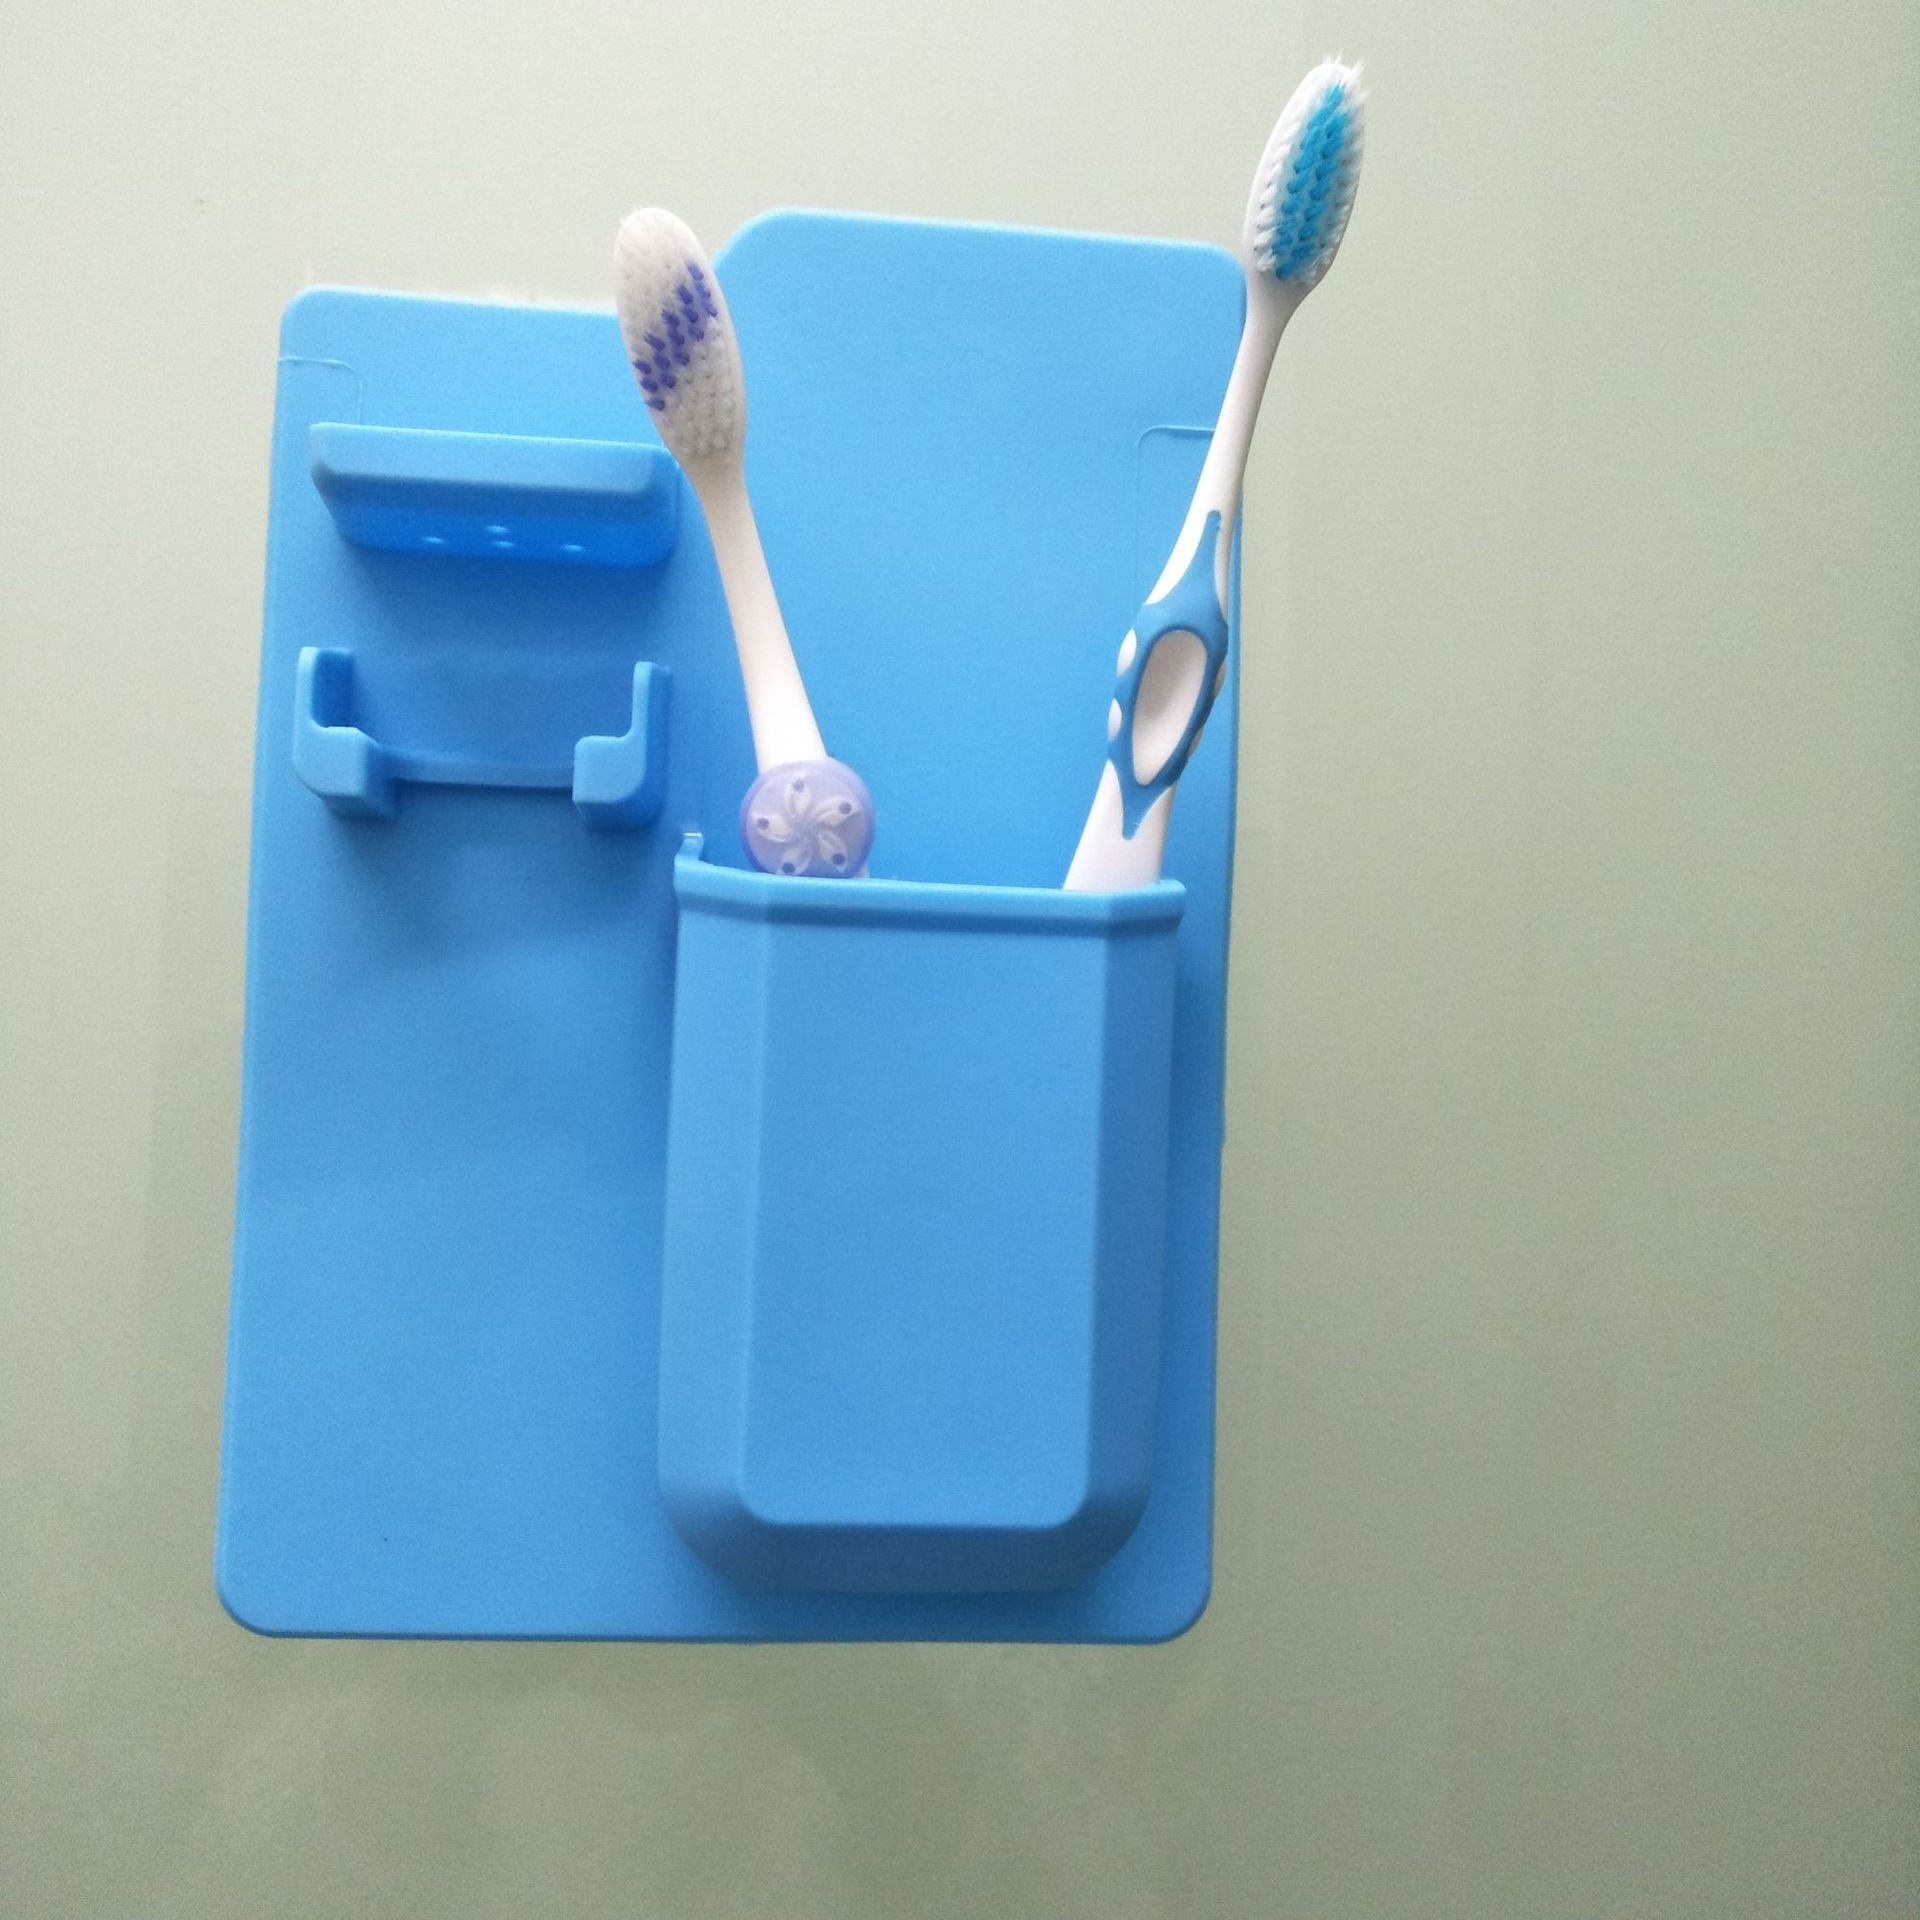 2Pcs Random Color Plastic Toothbrush Holder Toothpaste Holder Stand Bathroom Hot